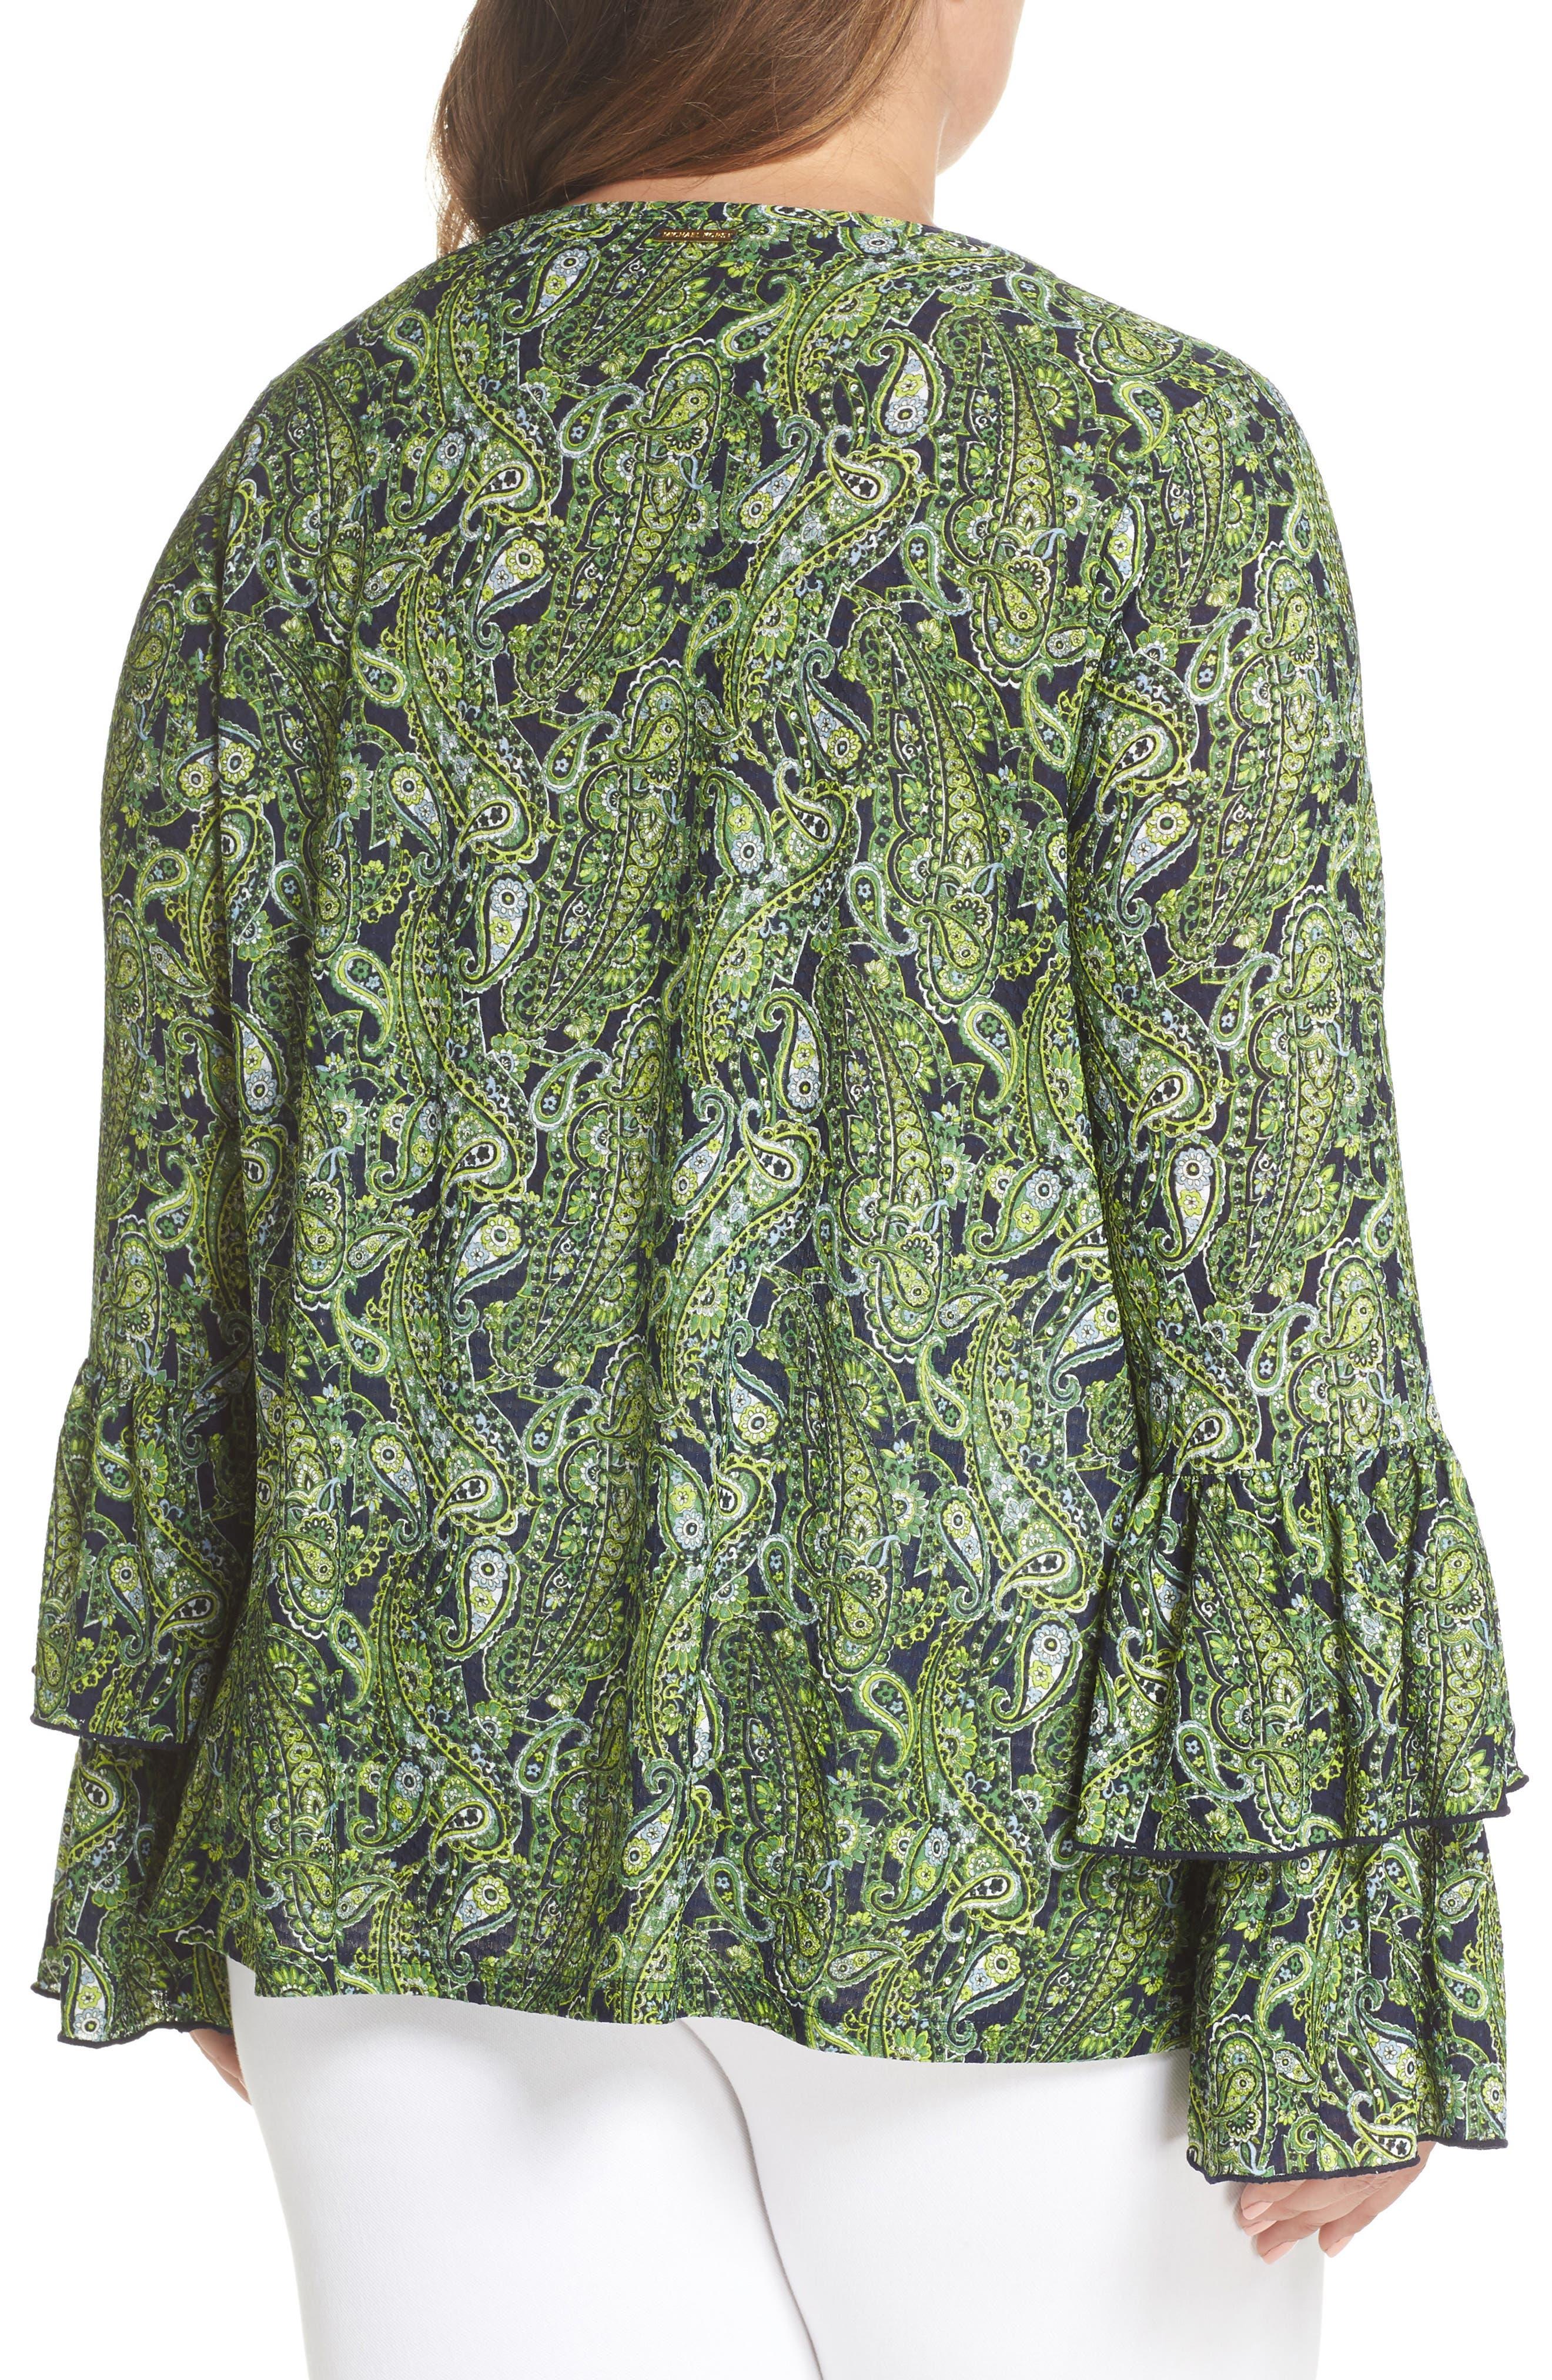 Pais Tier Sleeve Blouse,                             Alternate thumbnail 2, color,                             True Navy/ Green Apple Mu